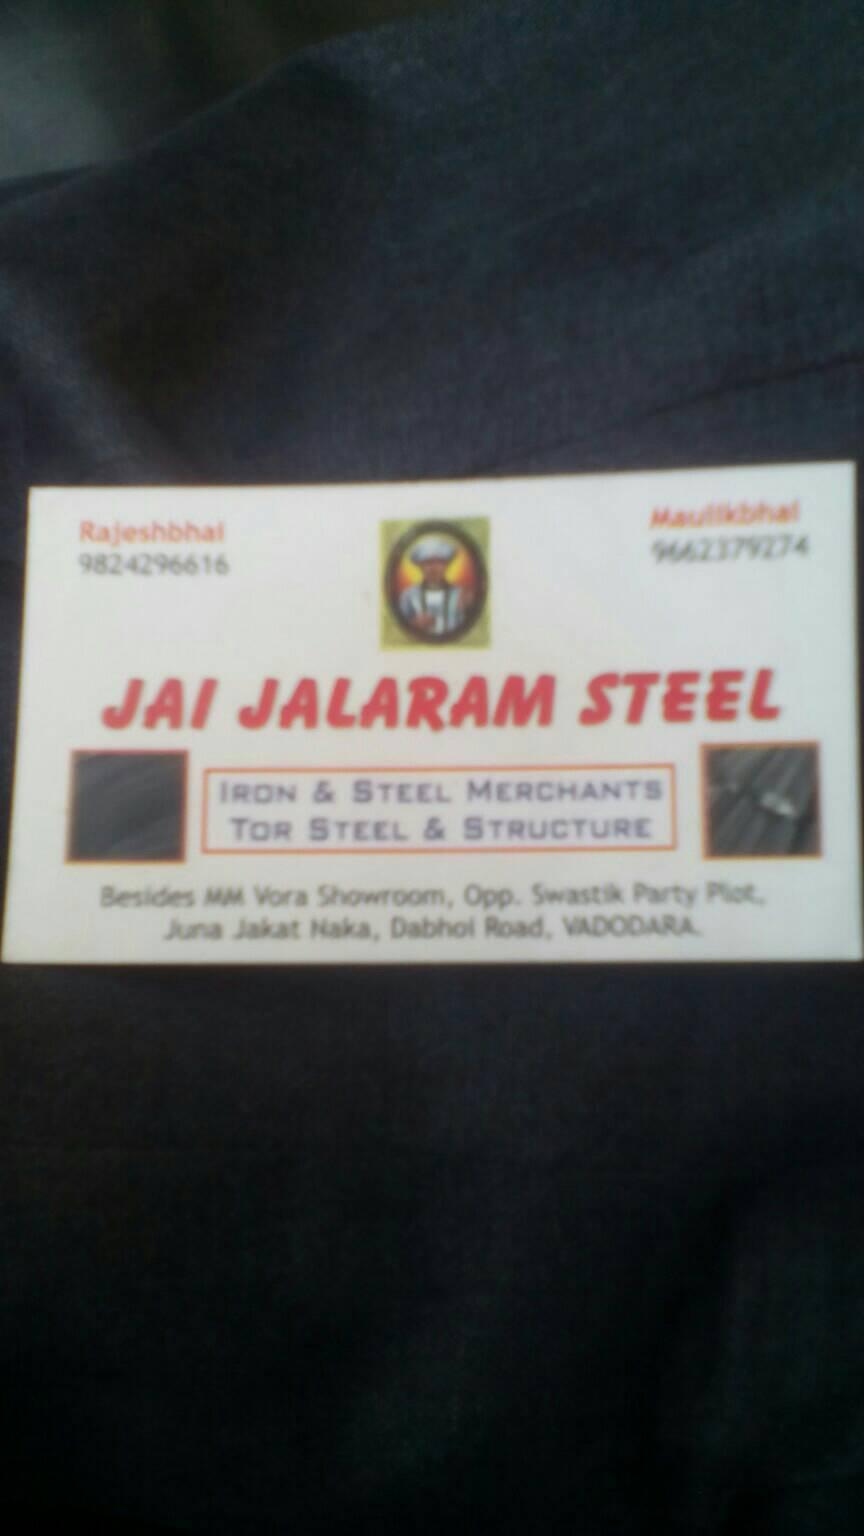 JAI JALARAM STEEL